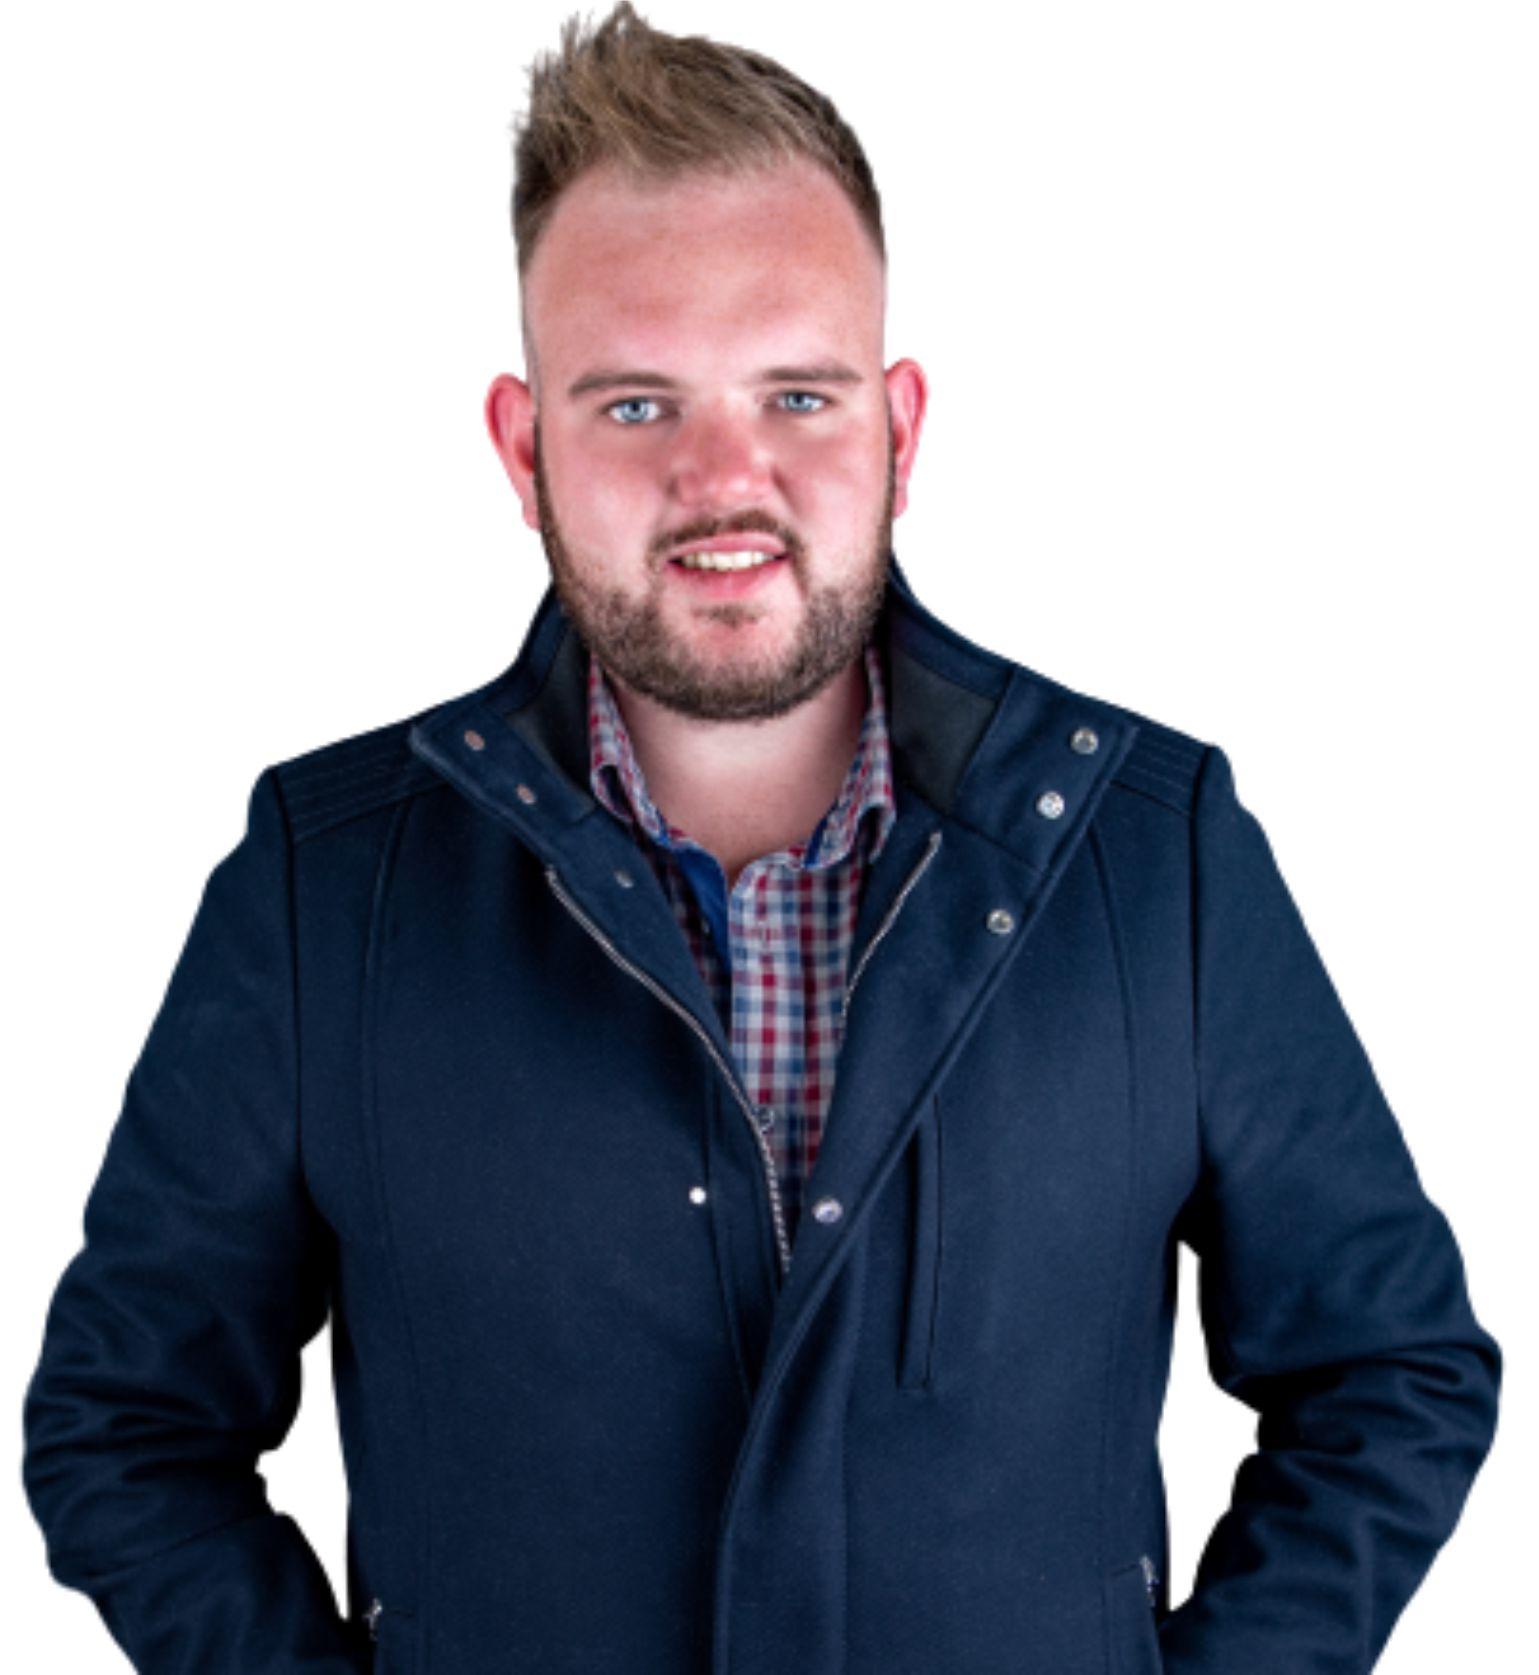 JJ van der Westhuizen